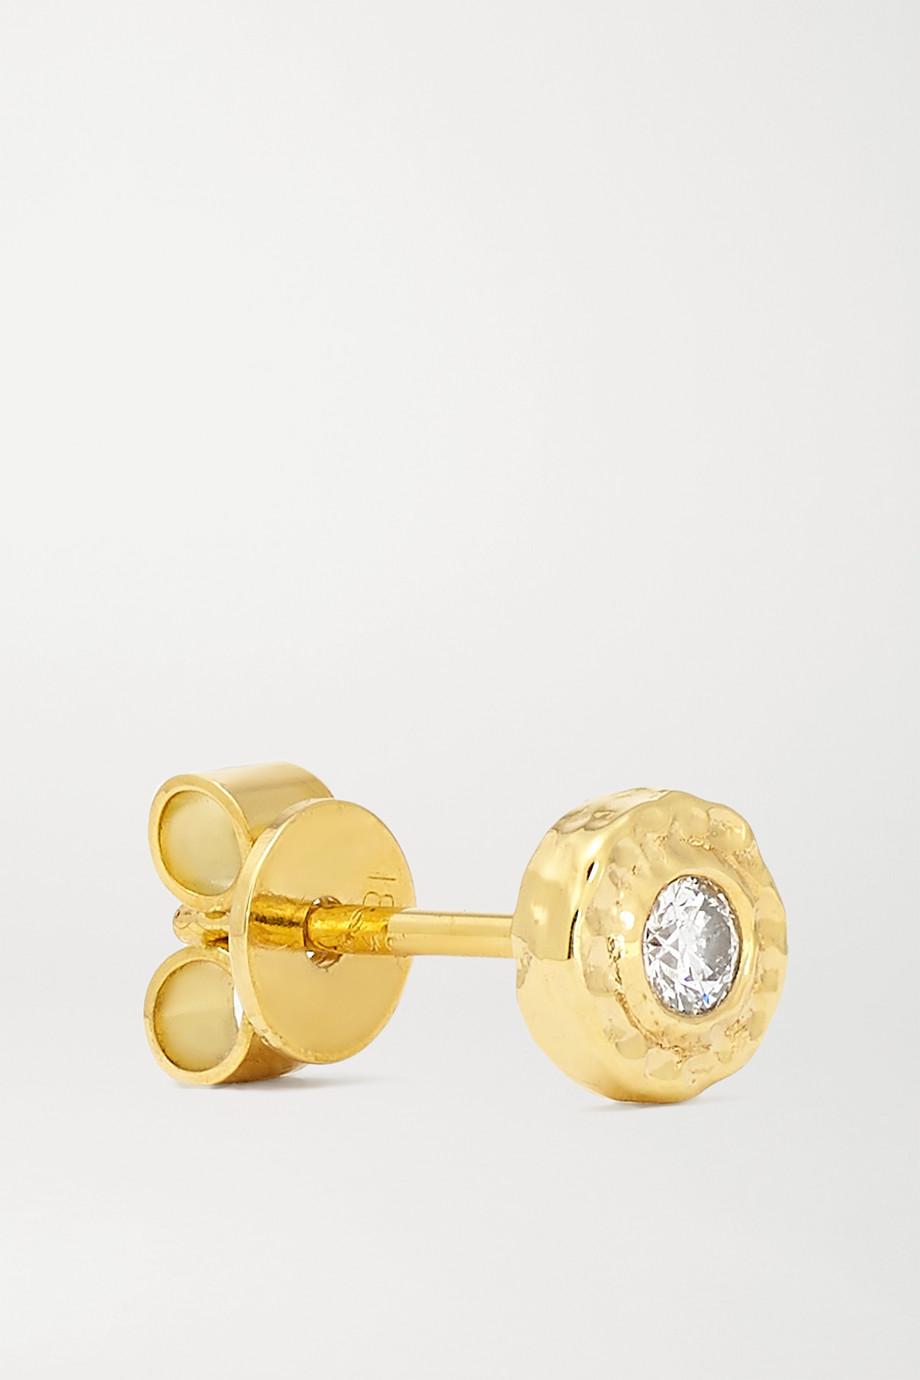 Octavia Elizabeth + NET SUSTAIN Nestling Gem 18-karat gold diamond earrings